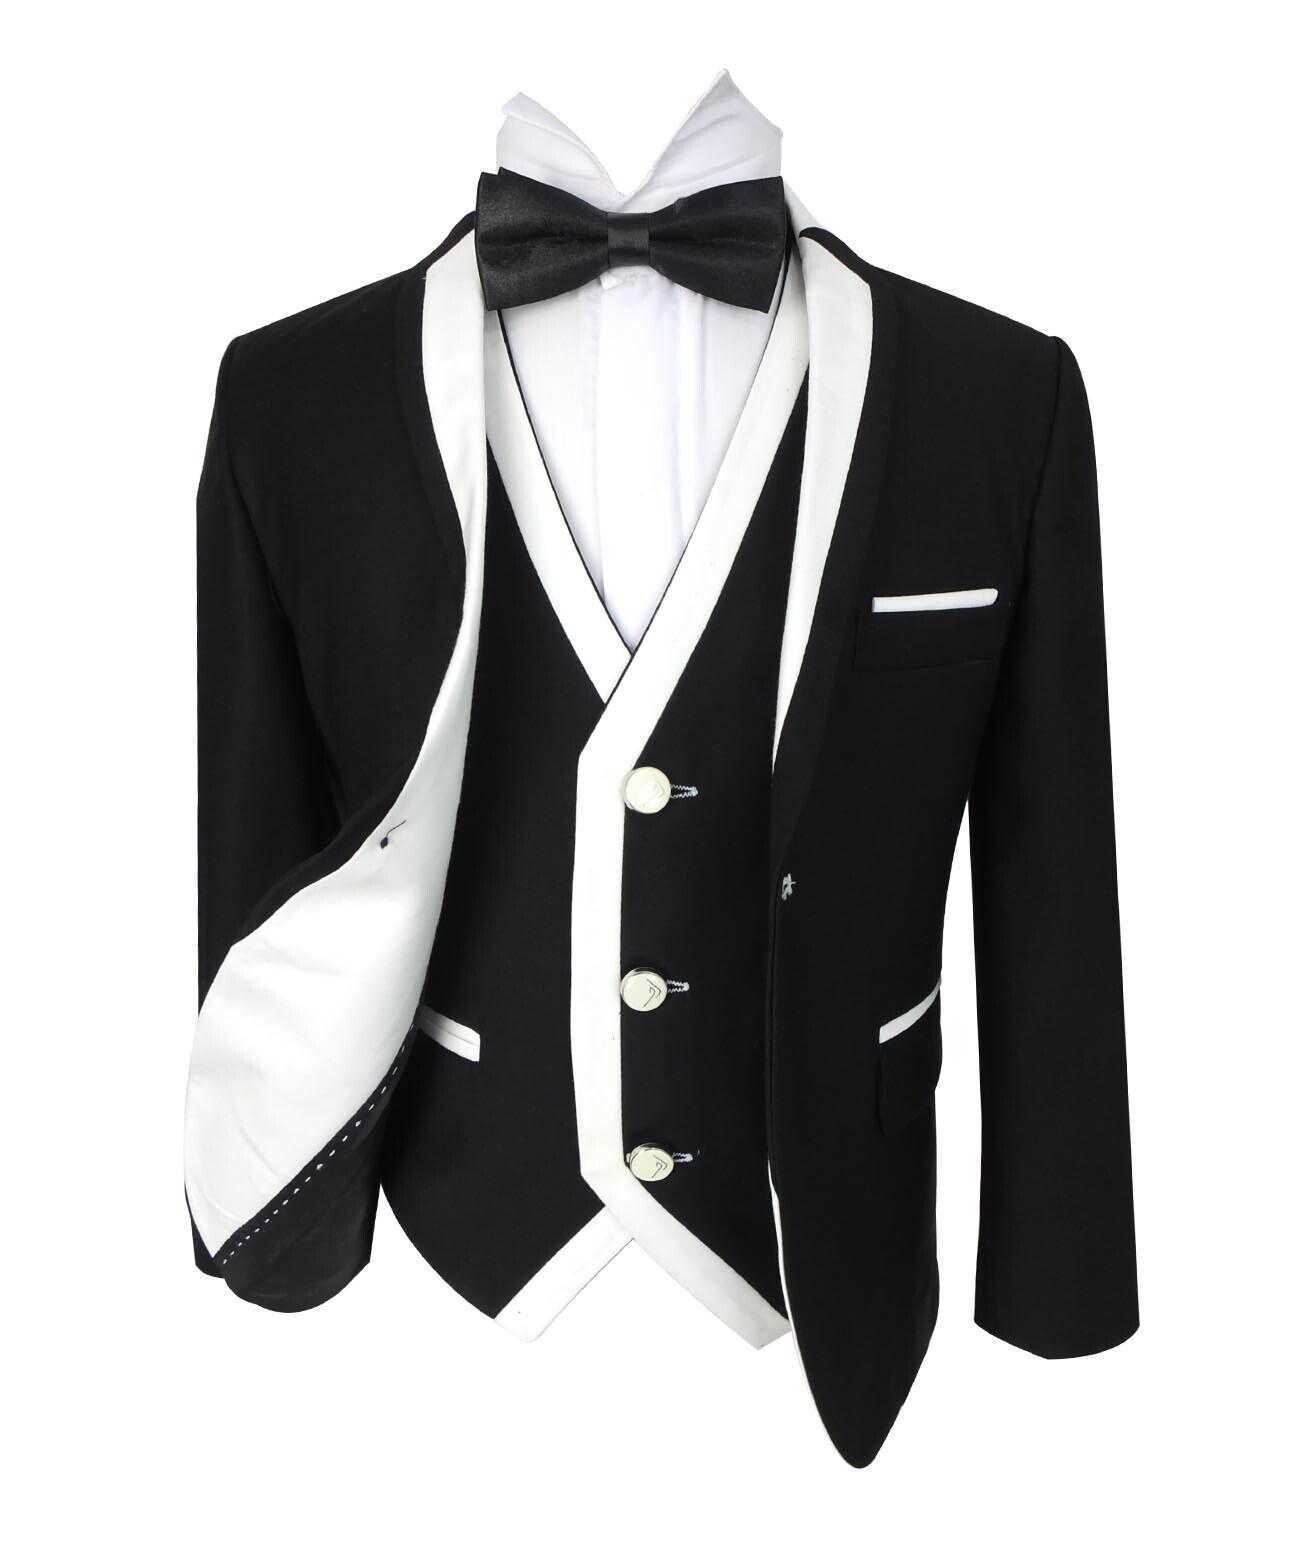 SIRRI Exclusive Black /& White Single Button Boys Suit Wedding Kids  Suits